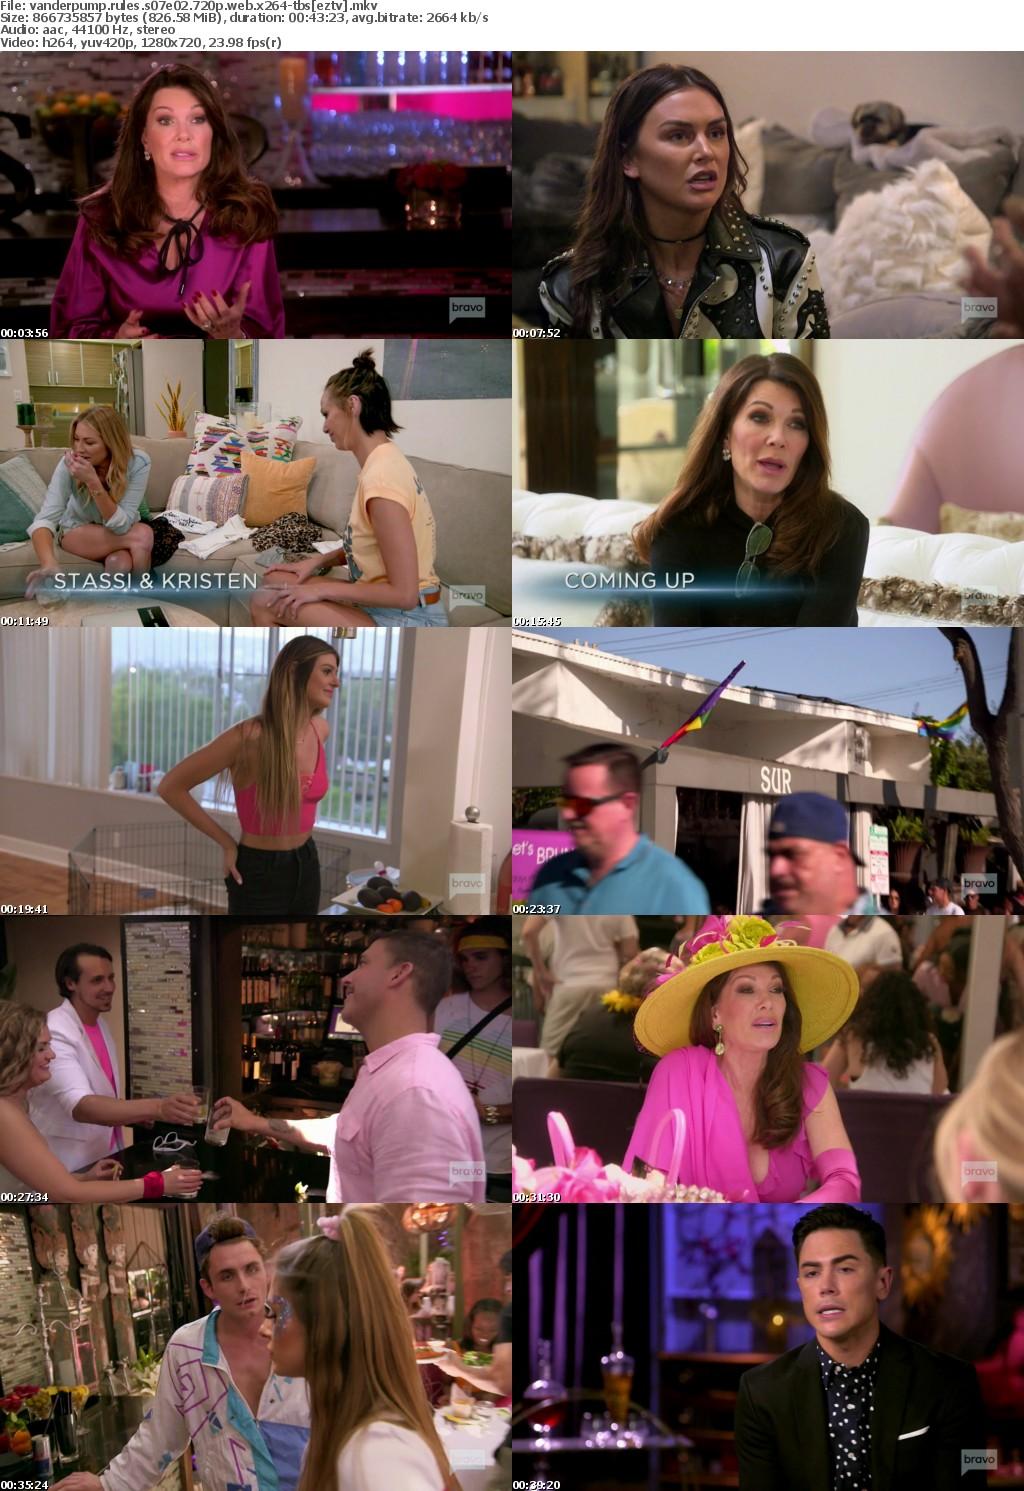 Vanderpump Rules S07E02 720p WEB x264-TBS